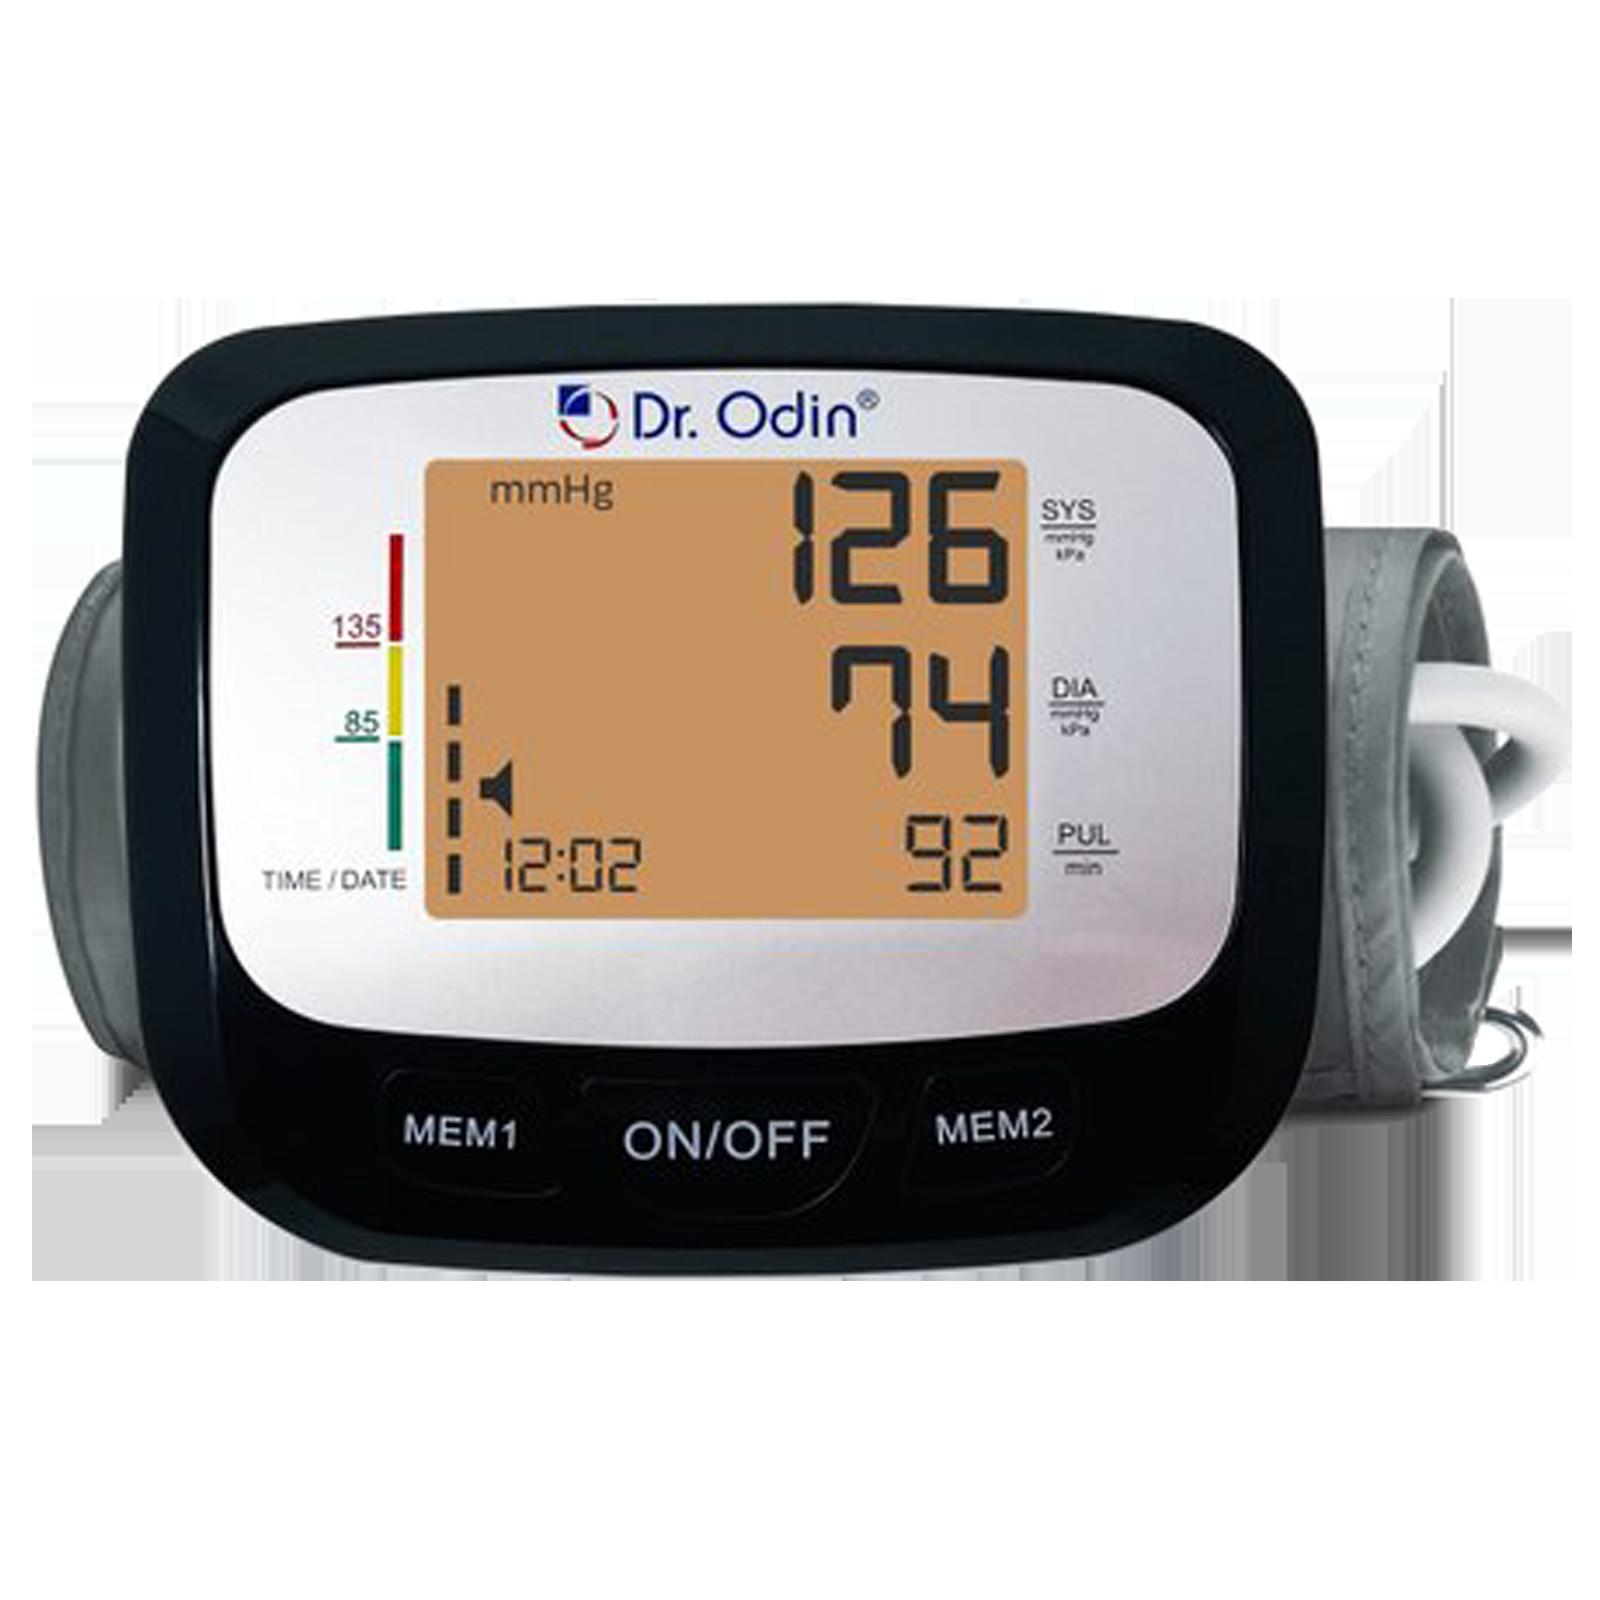 Dr. Odin LCD Blood Pressure Monitor (Intelligent Compression, TSB-602S, Black)_1